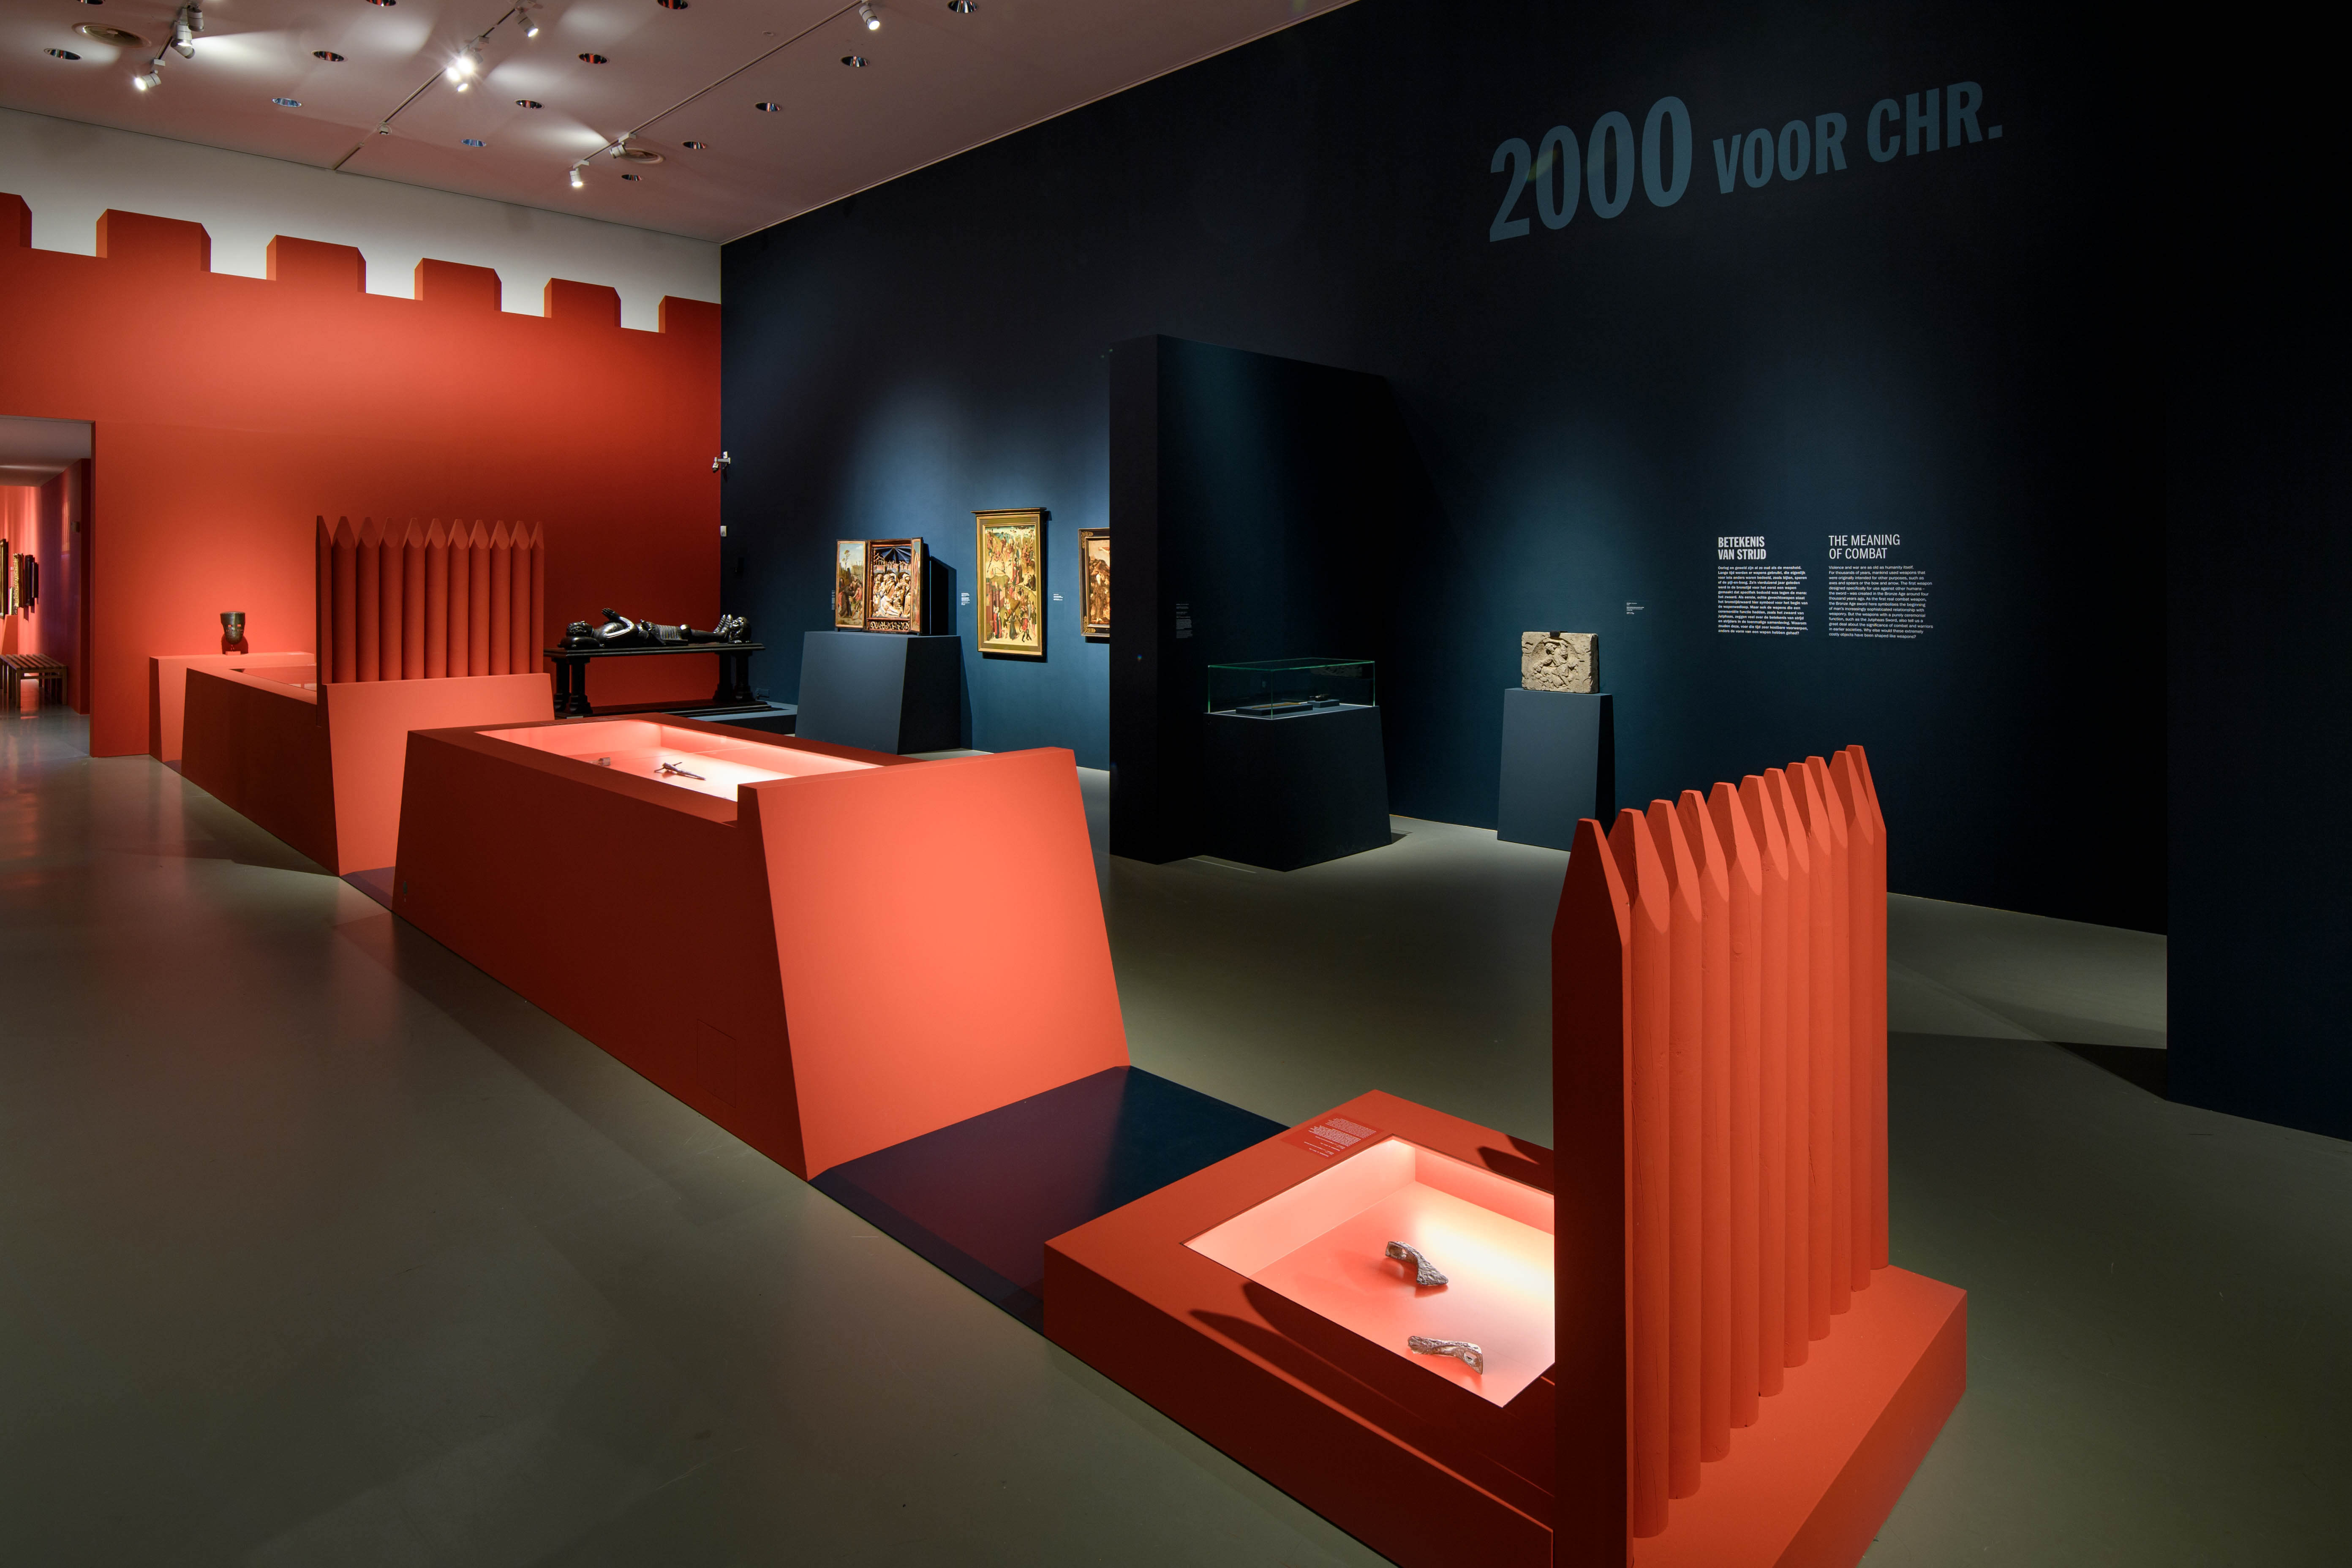 tentoonstelling de ommuurde stad centraal museum 1 3 jpg